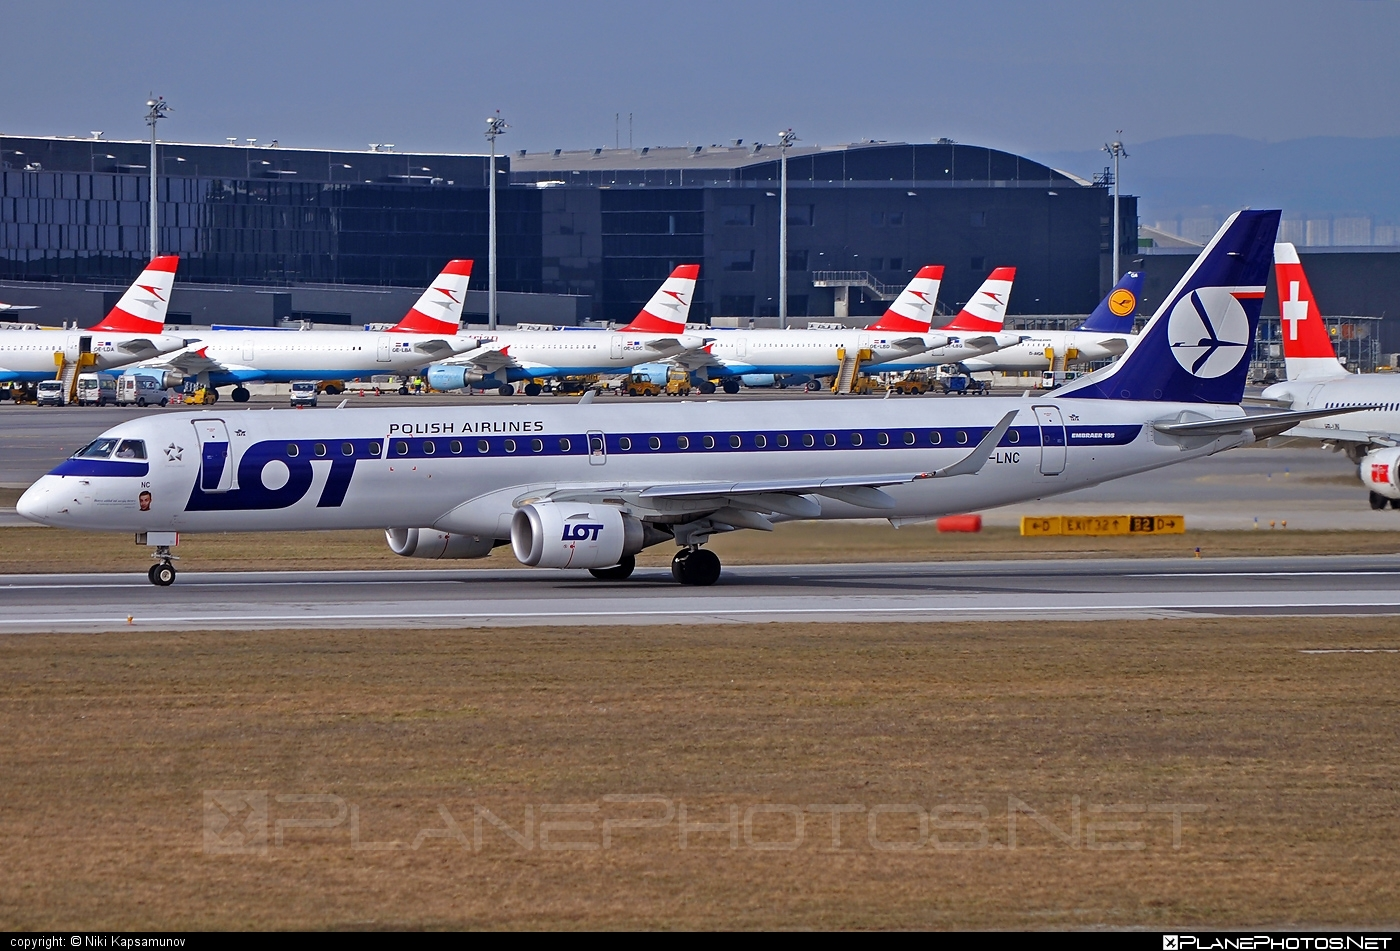 Embraer E195LR (ERJ-190-200LR) - SP-LNC operated by LOT Polish Airlines #e190 #e190200 #e190200lr #e195lr #embraer #embraer190200lr #embraer195 #embraer195lr #lot #lotpolishairlines